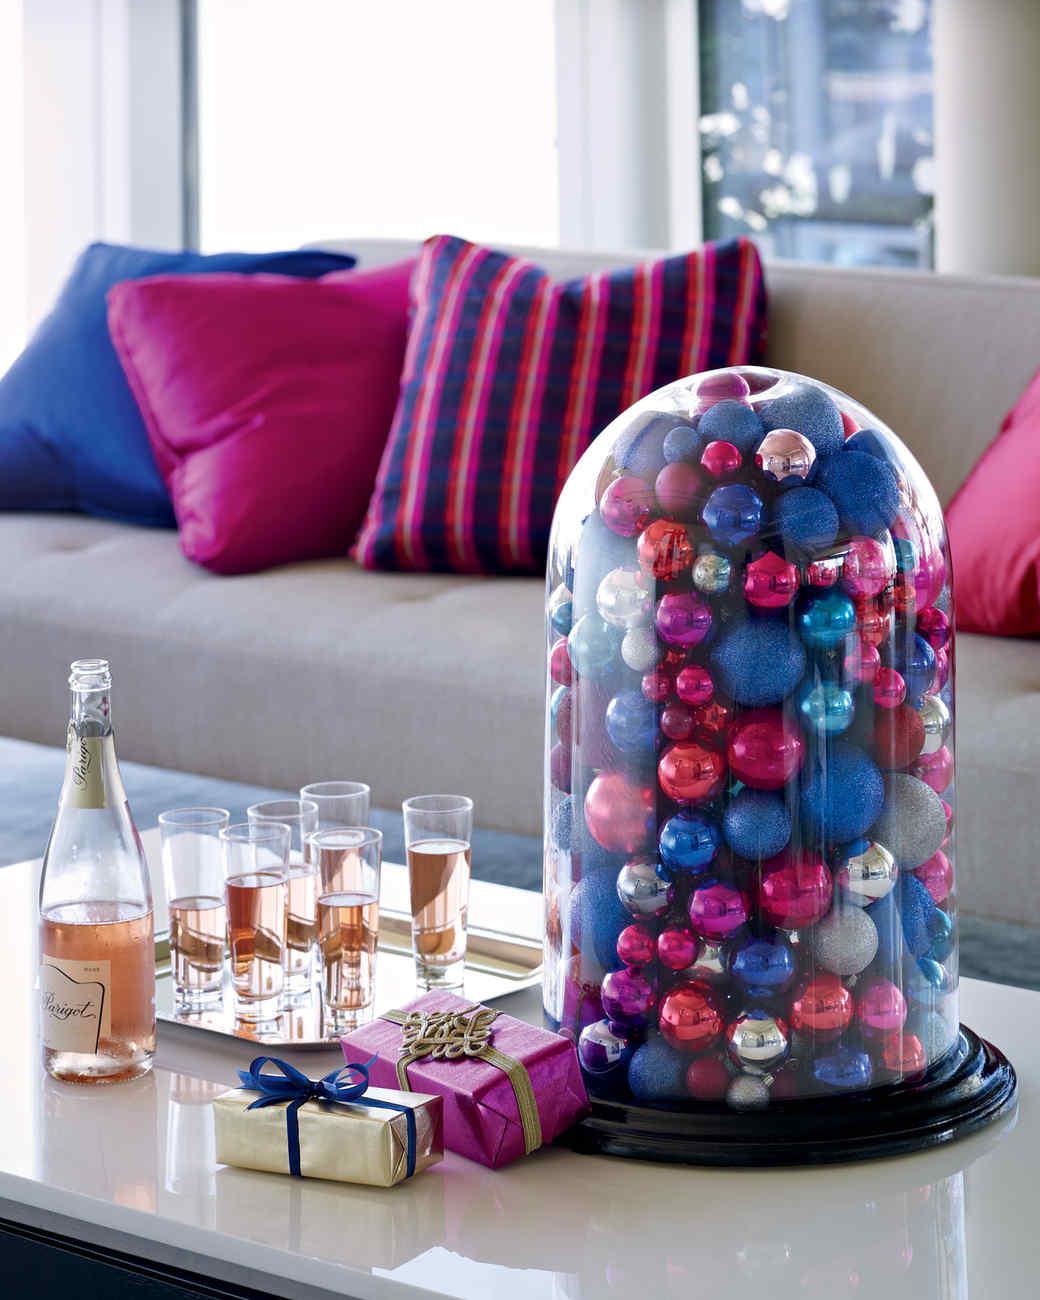 glass-dome-mld107903.jpg